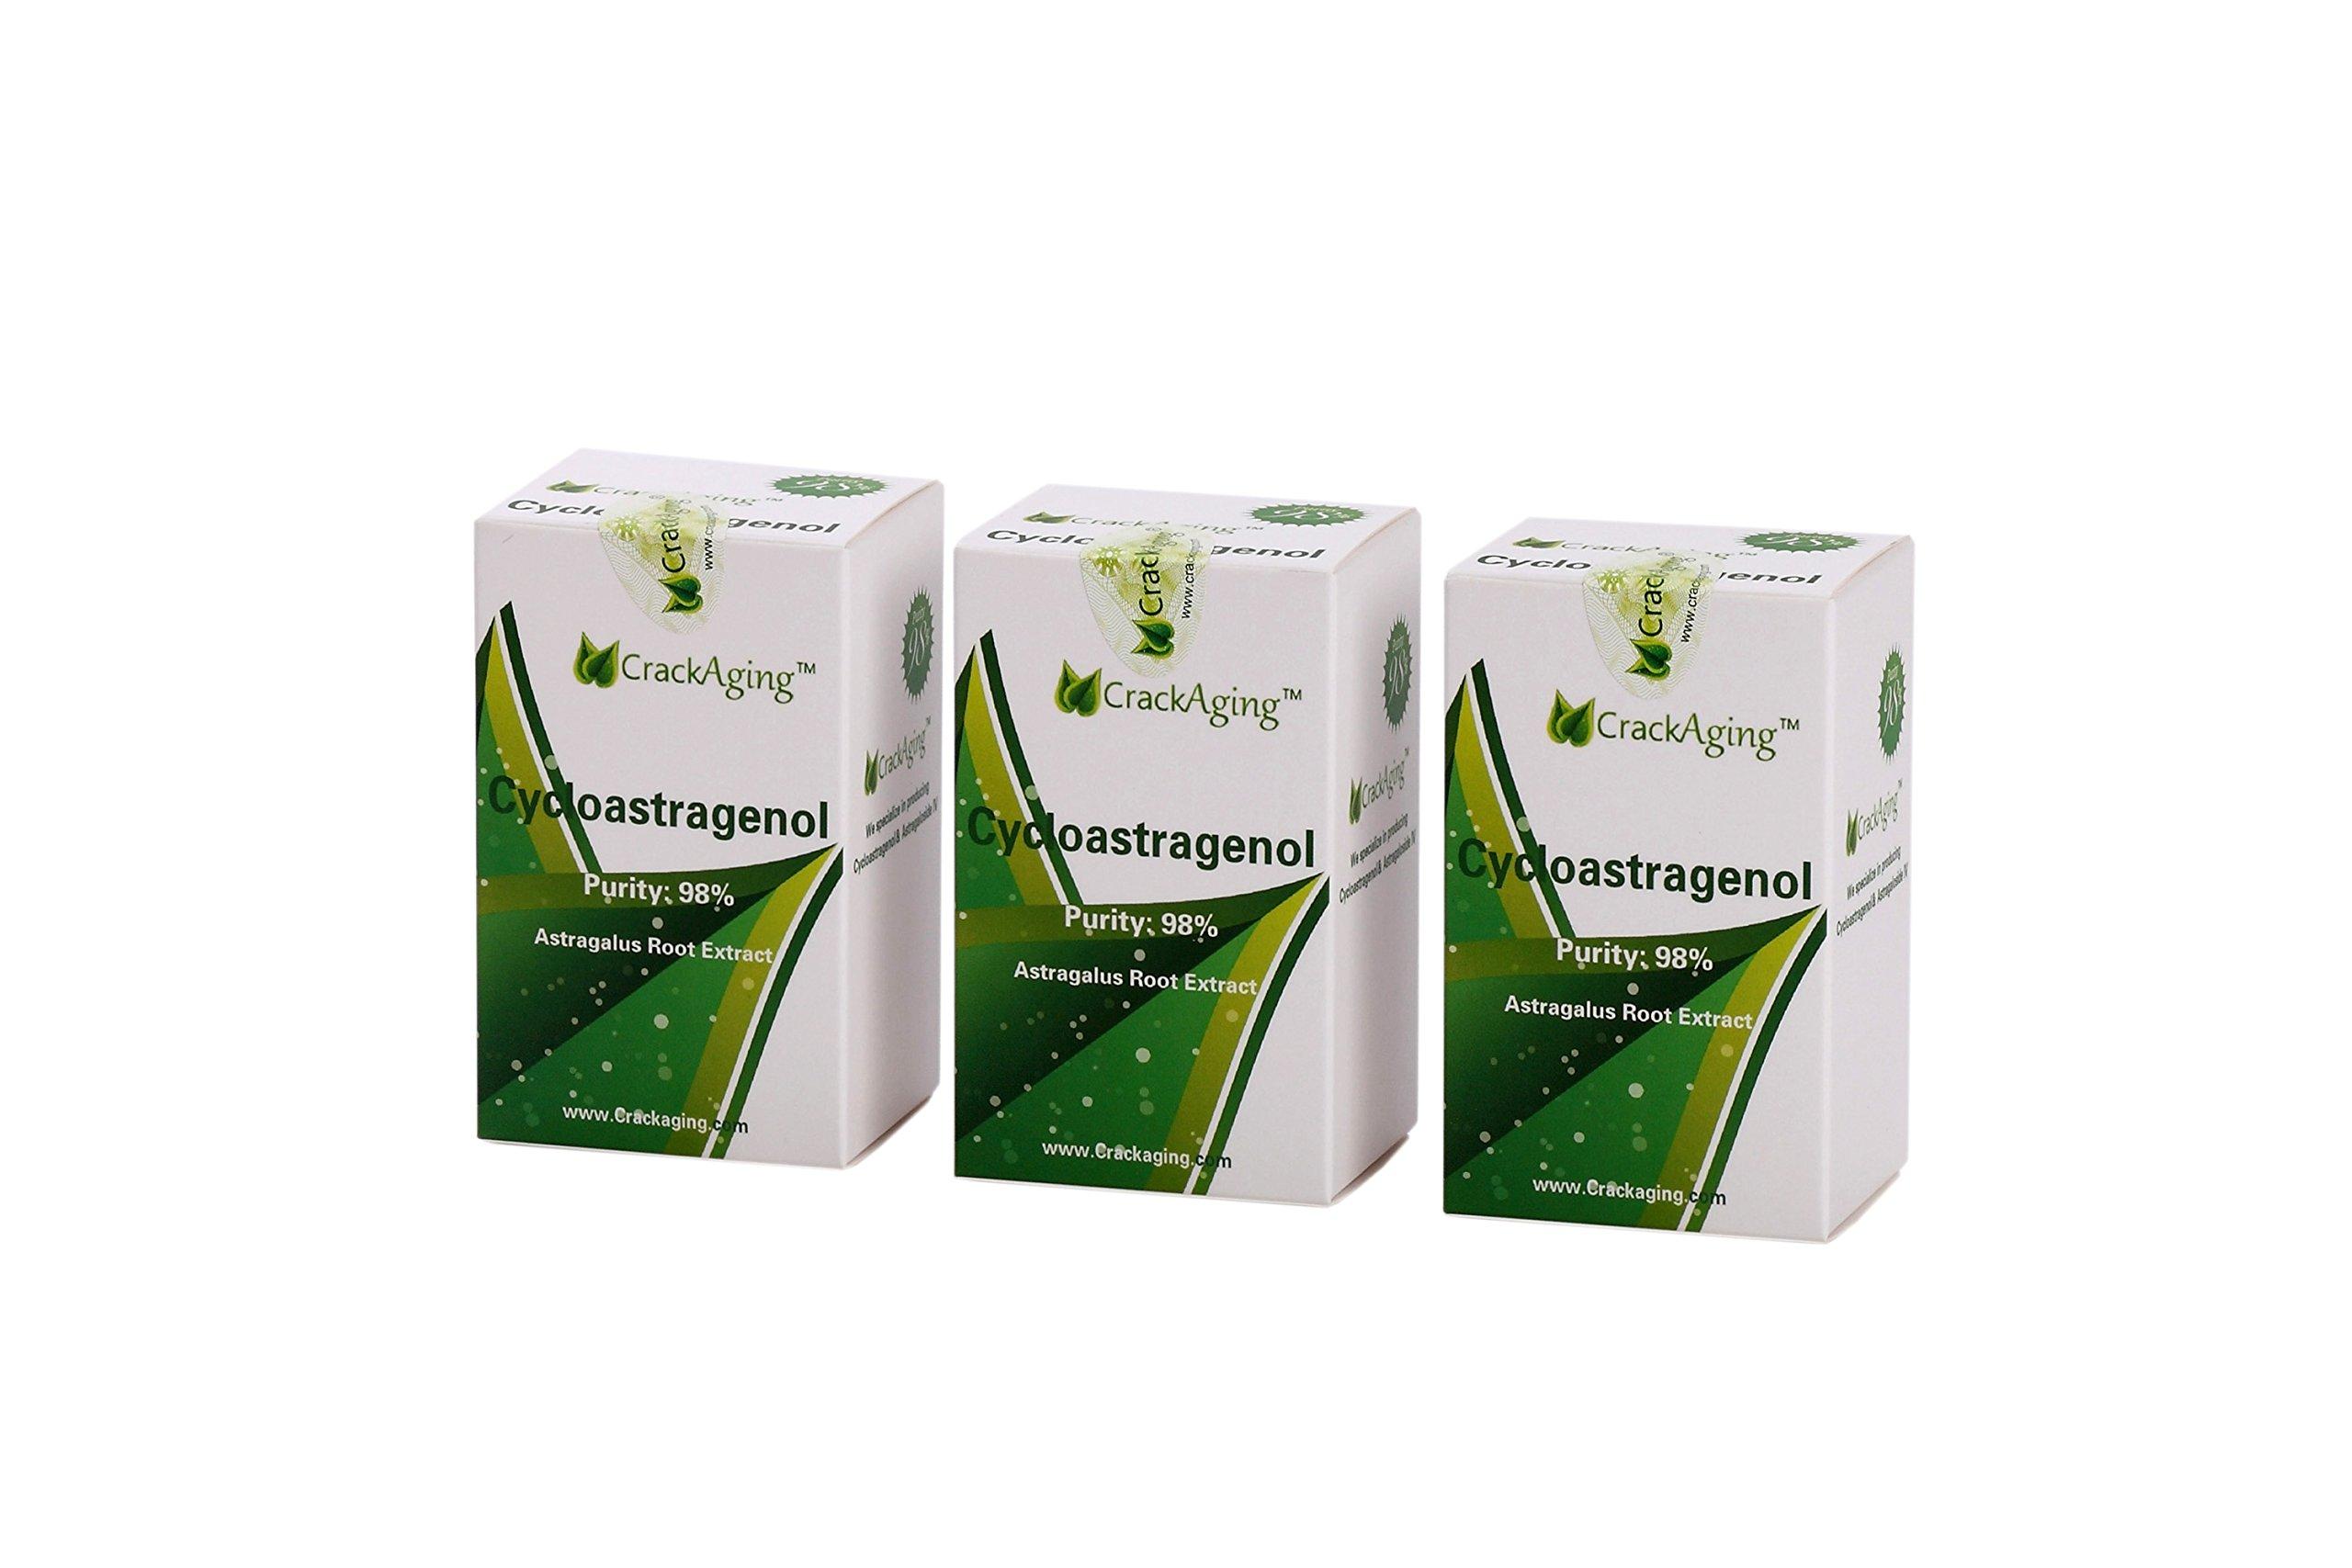 Super-Absorption Cycloastragenol 98% (25mg/cap, 180 Caps in 3 Bottles)